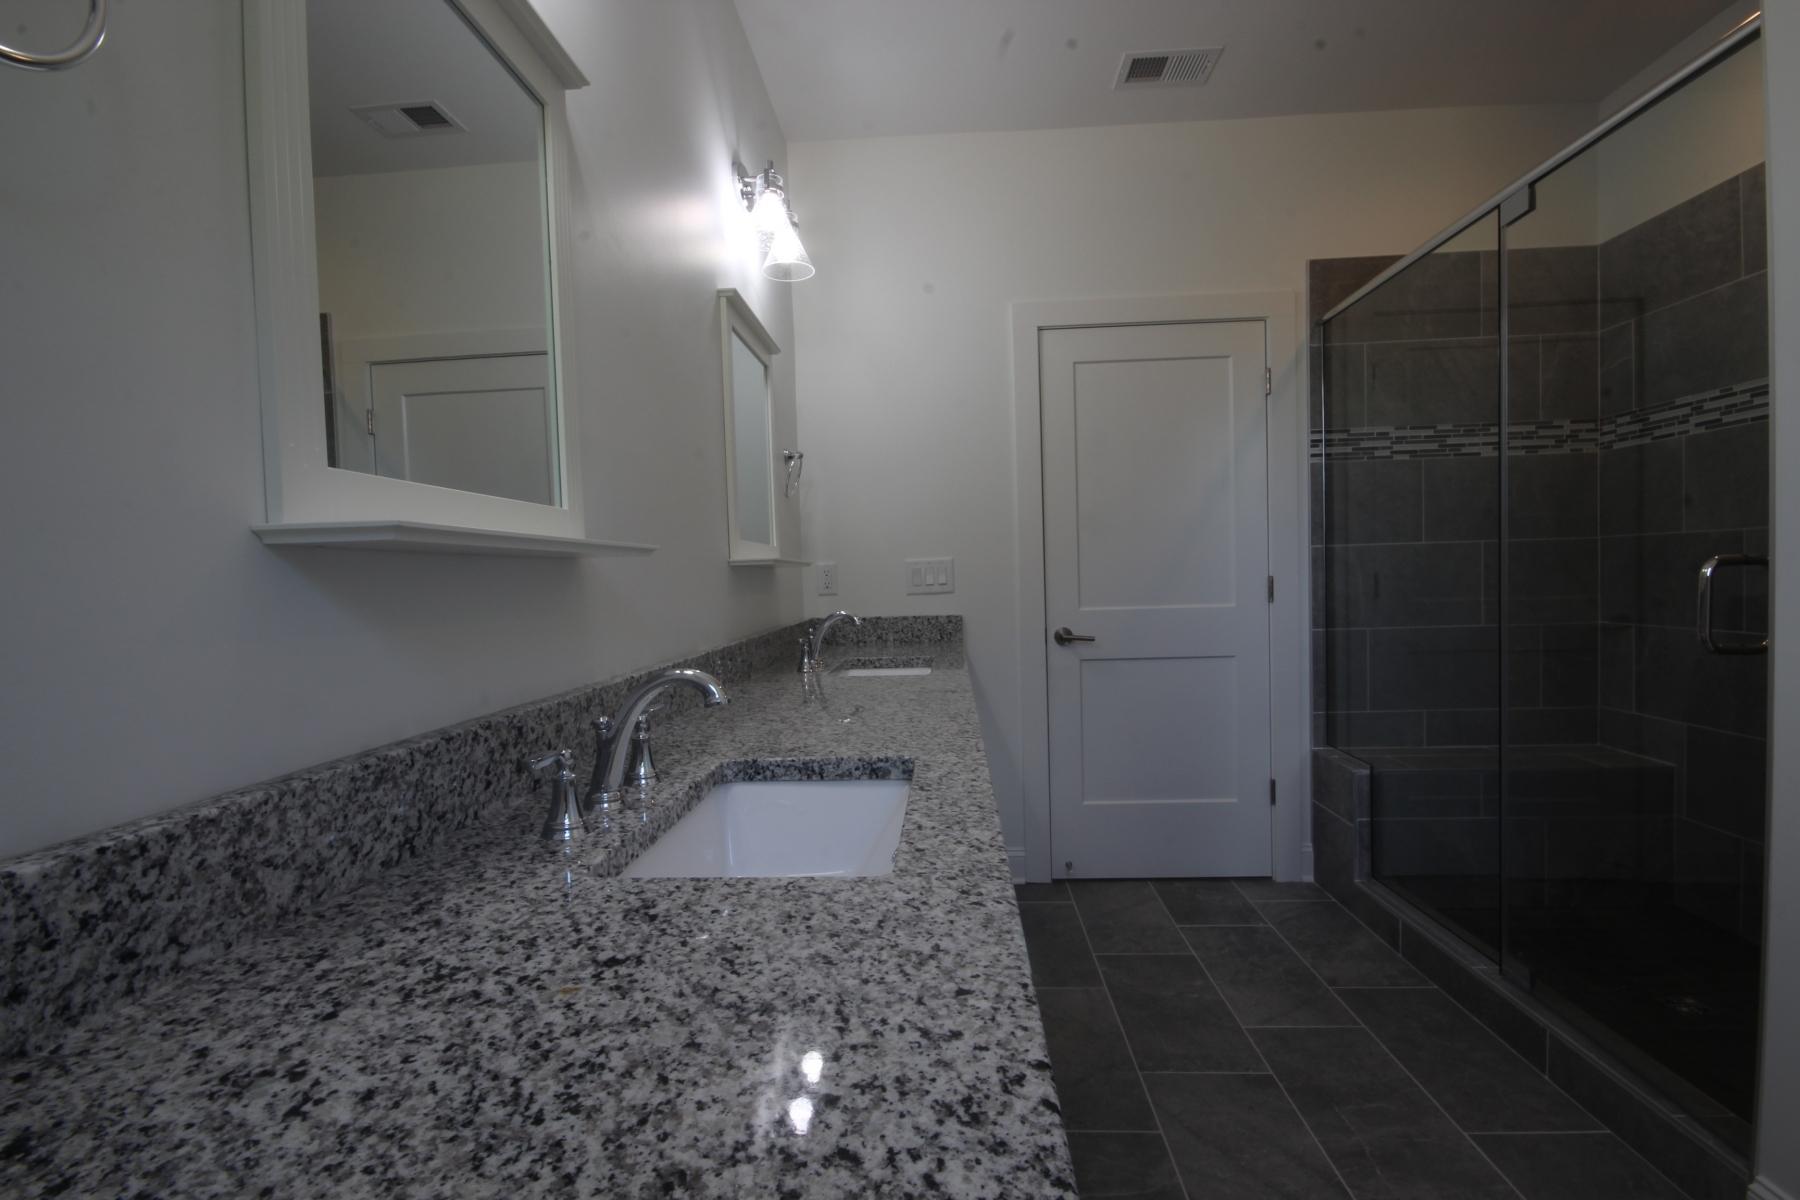 1_761-ss-bathroom-remodel-2